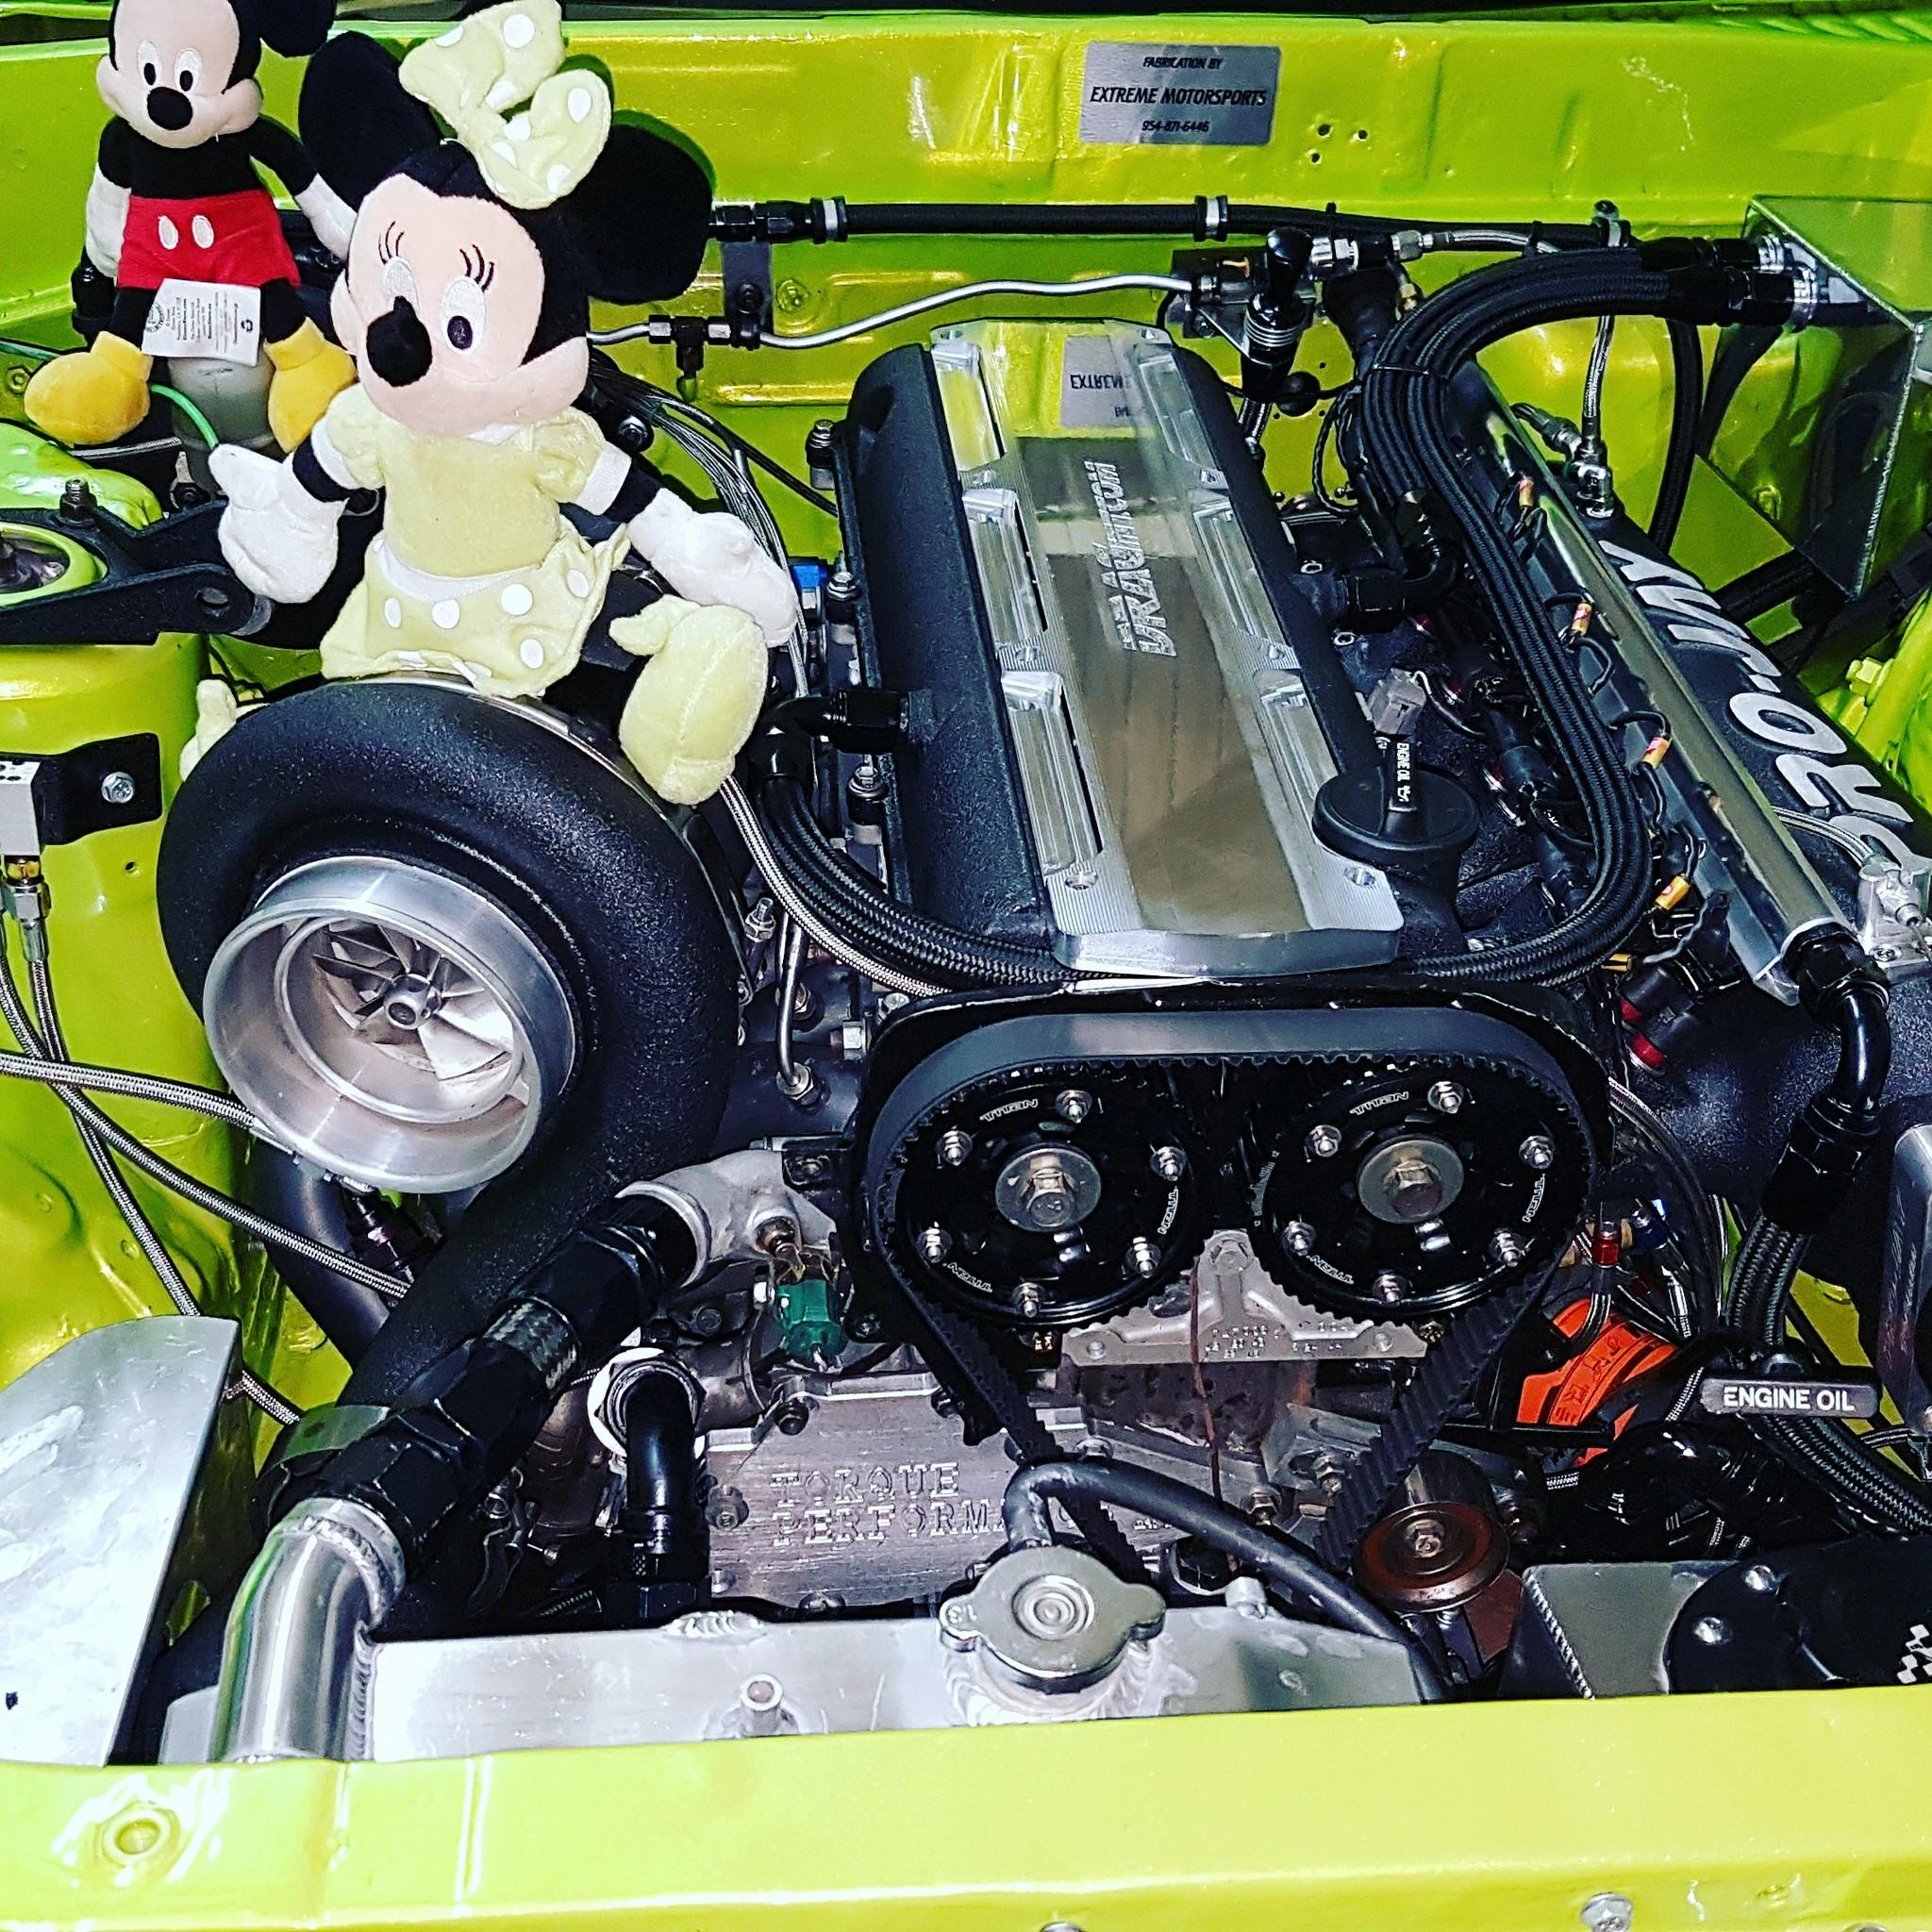 Nissan R32 Skyline with a 1800 hp 2JZ Goes 6 98 sec – Engine